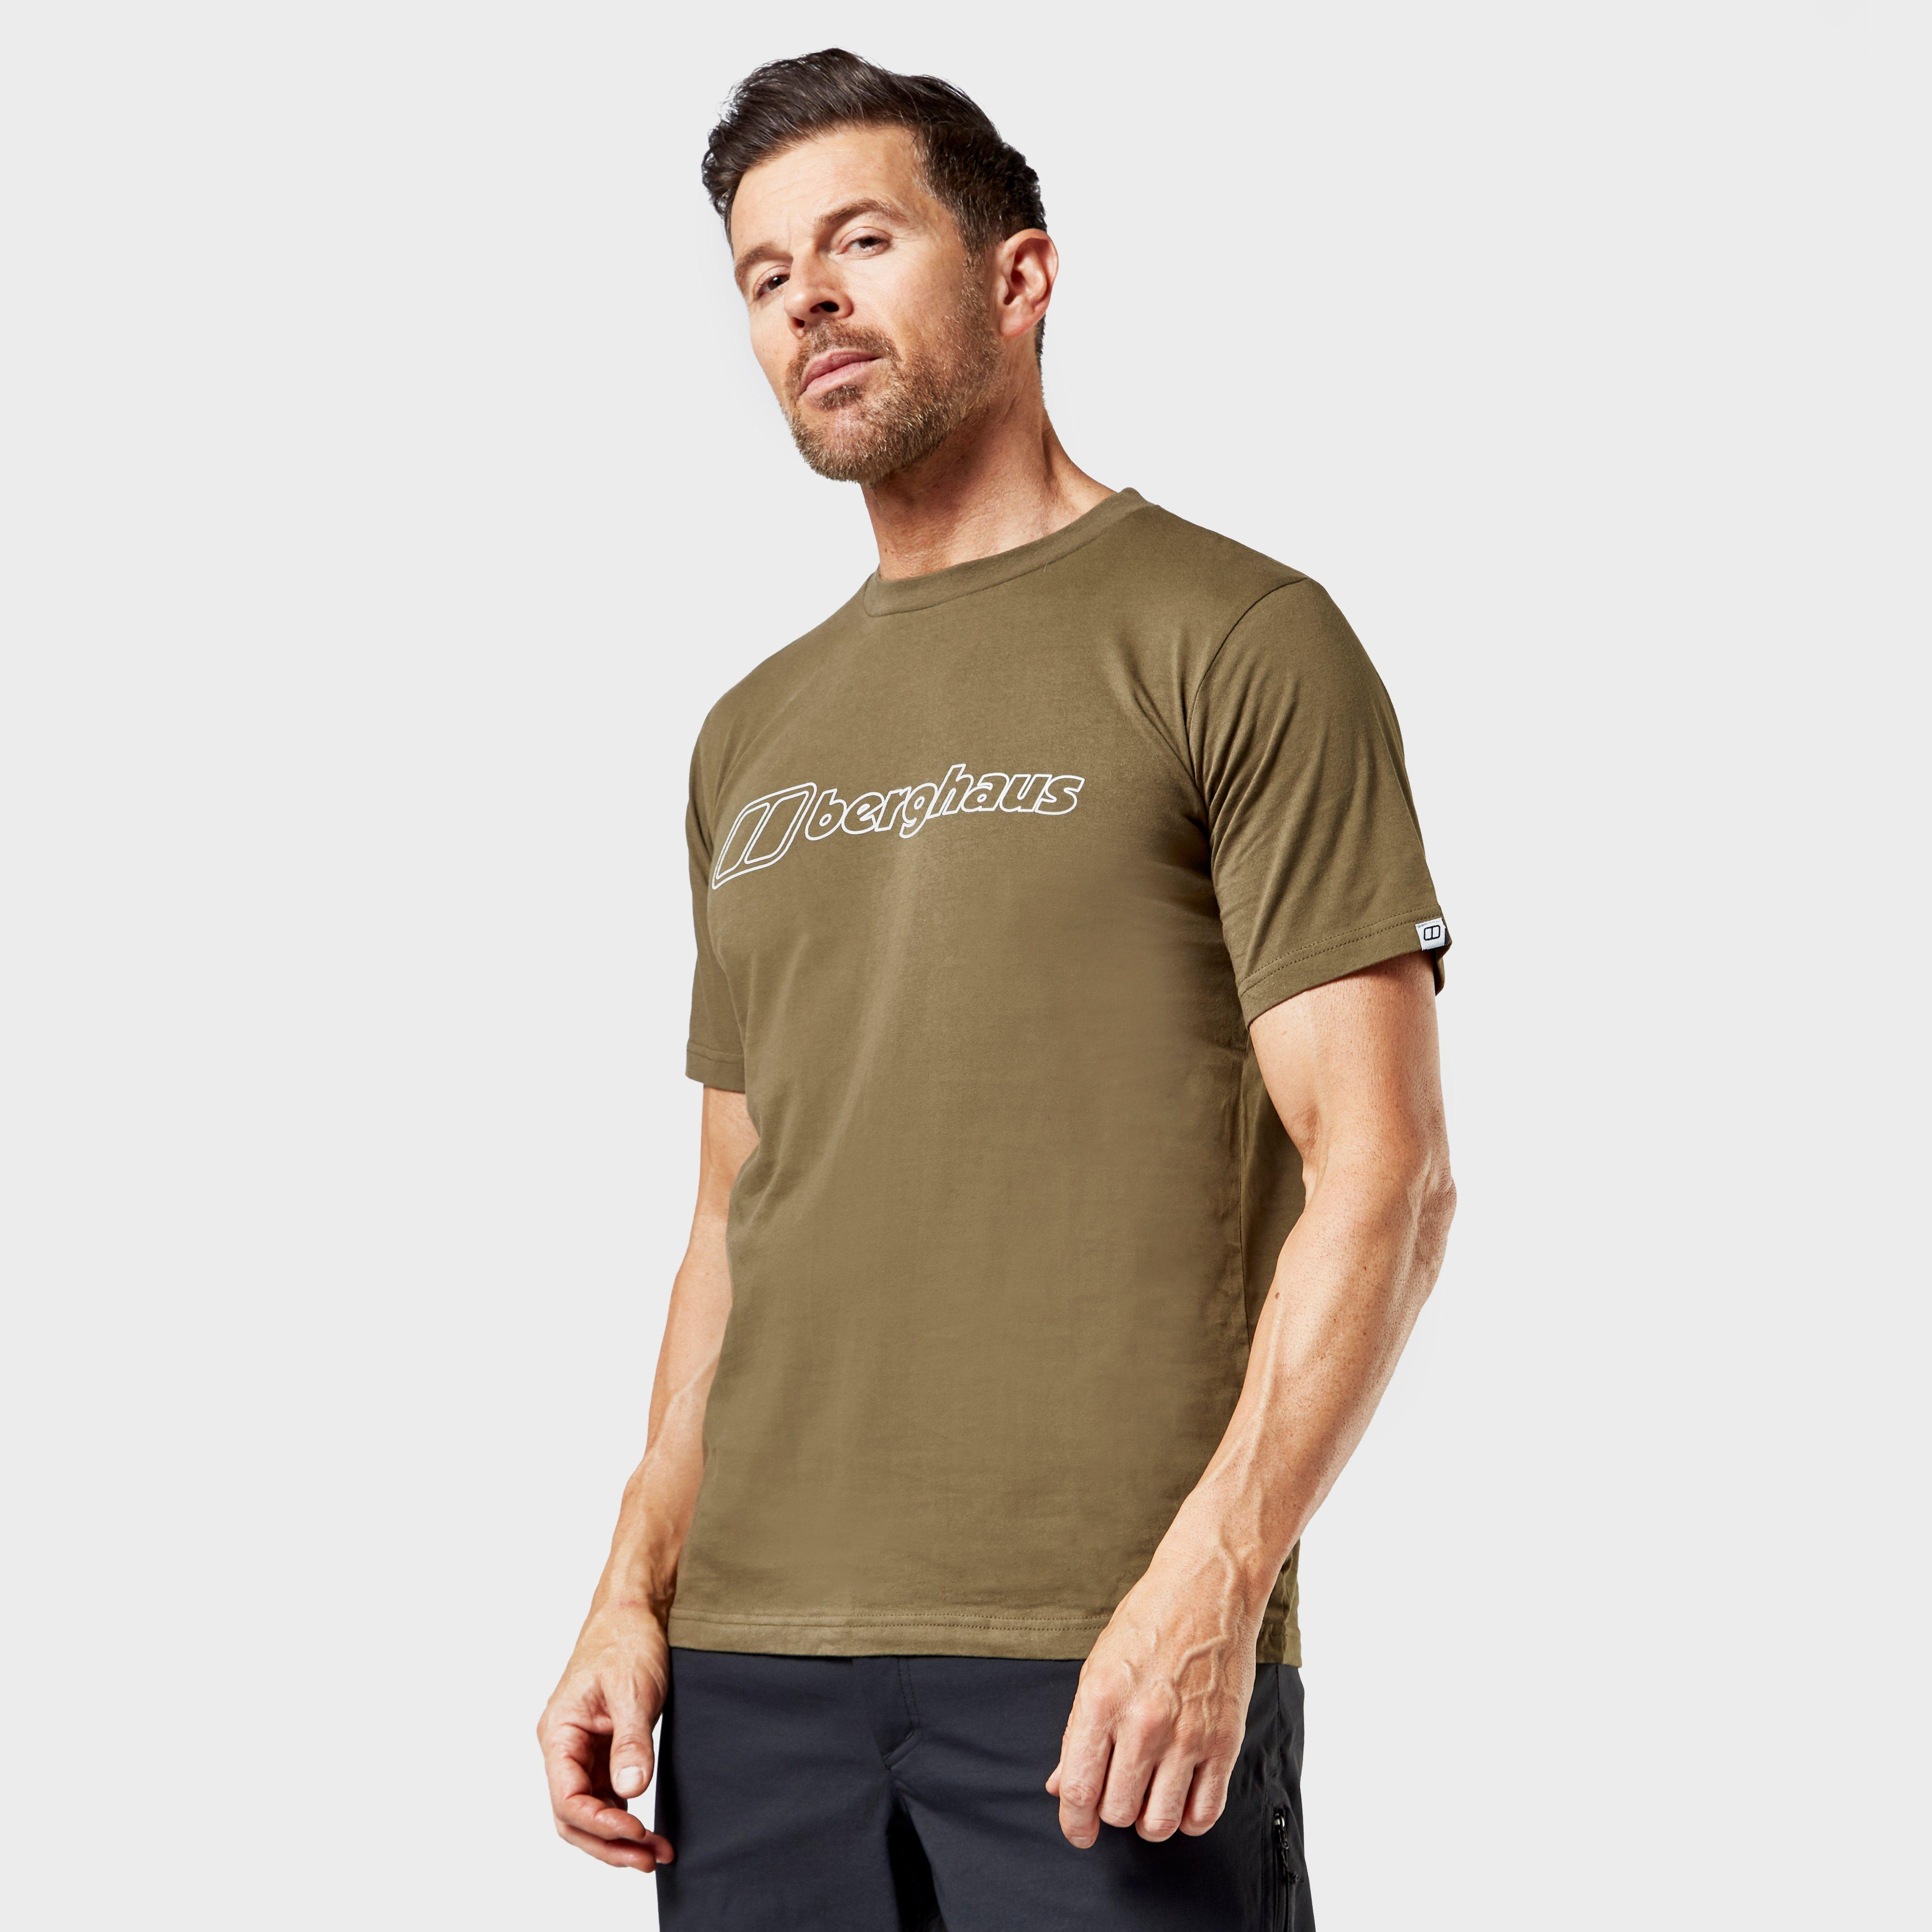 Berghaus Mens Big Outline Logo T-shirt - Green/tee  Green/tee